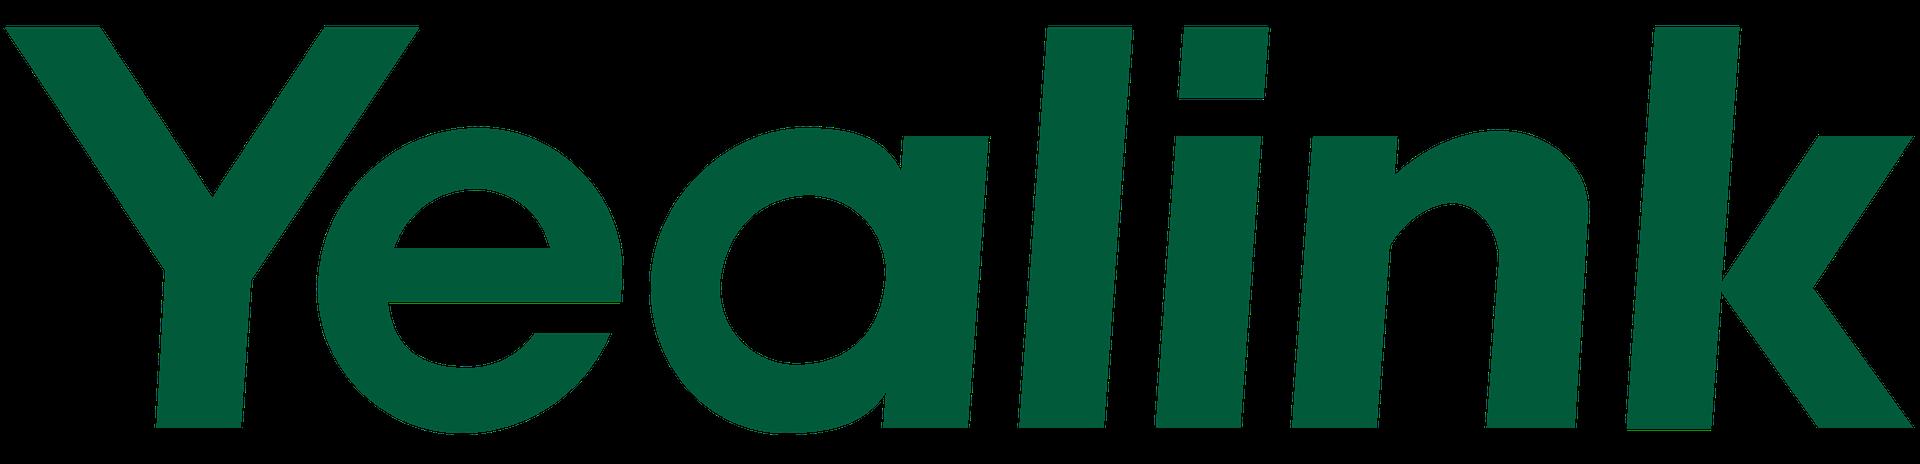 Russ Fry - Yealink_logo